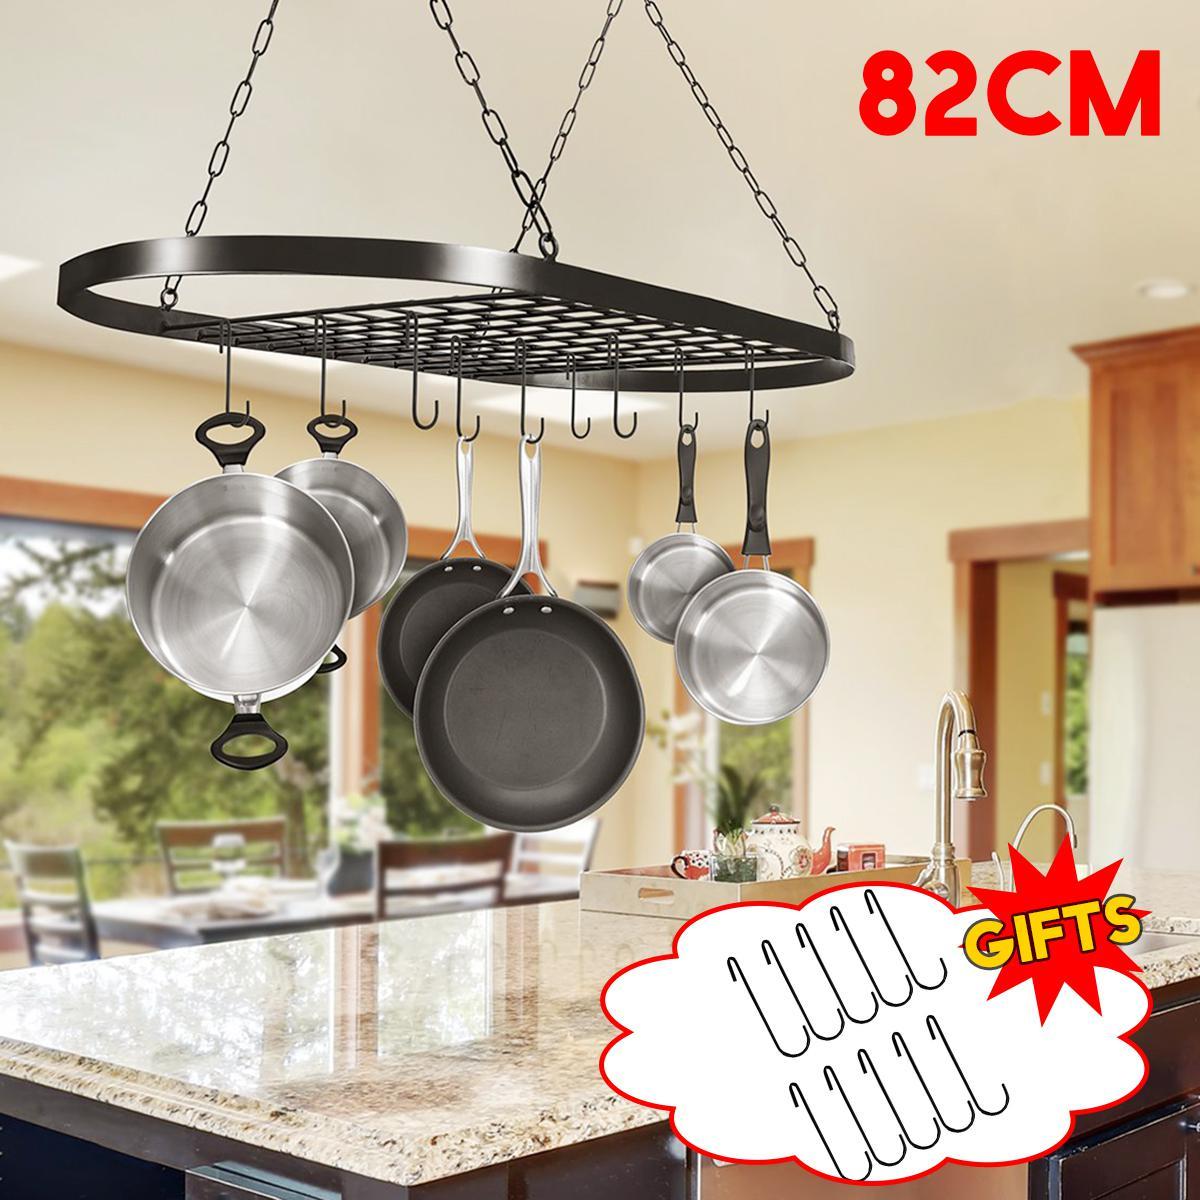 iron hanging pot saucepan pan hanger storage rack 10 hooks large cookware racks holders